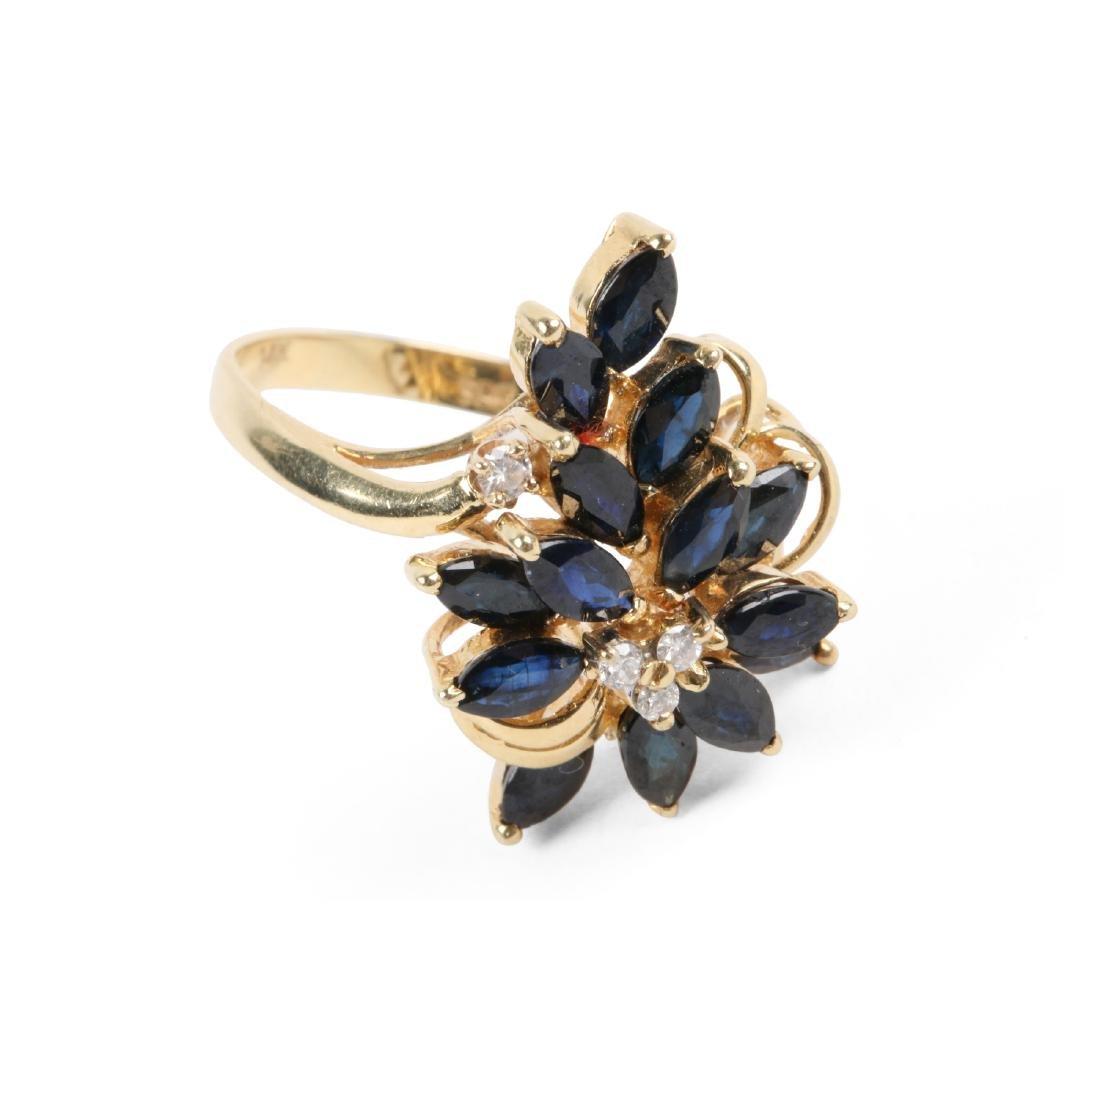 A 14K, Sapphire & Diamond Ring